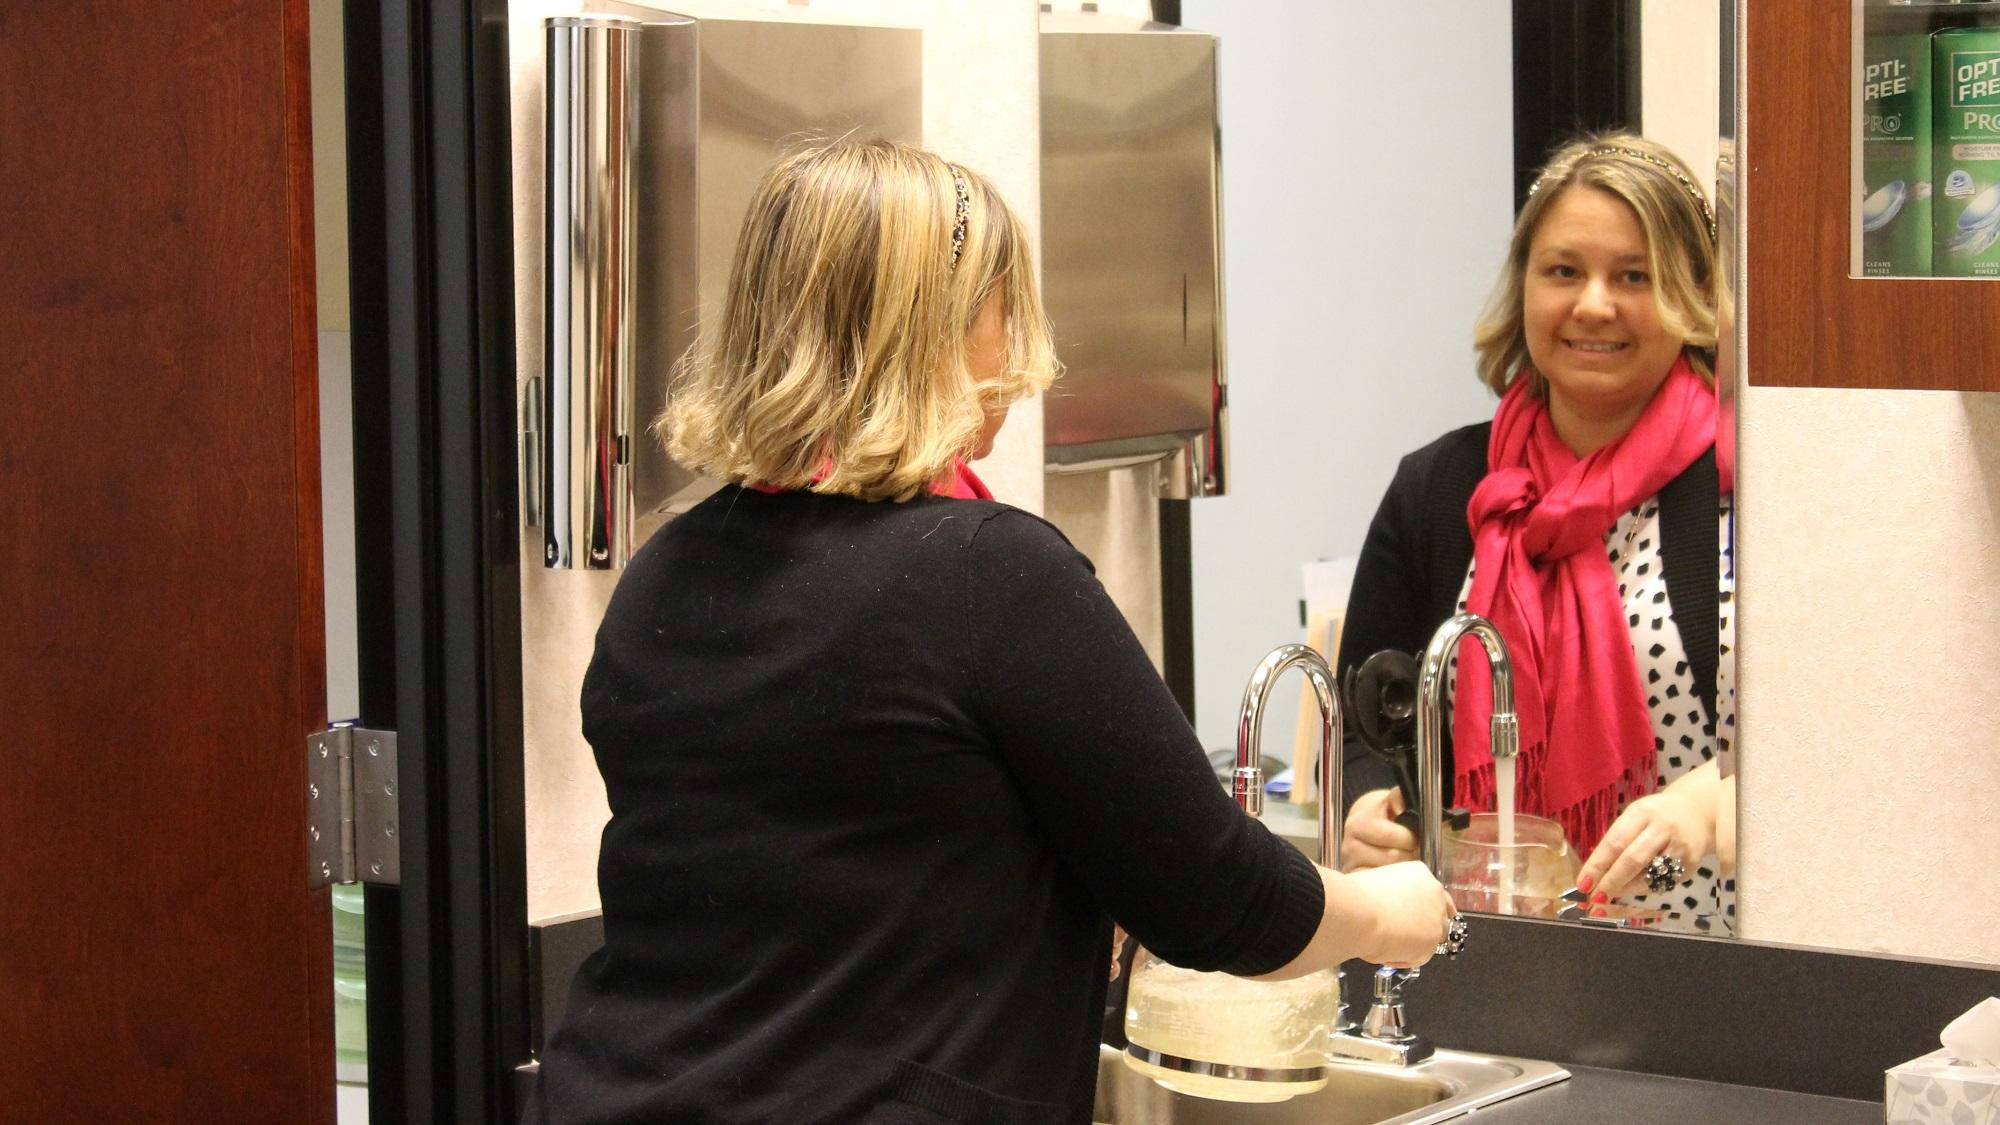 staff-making-coffee